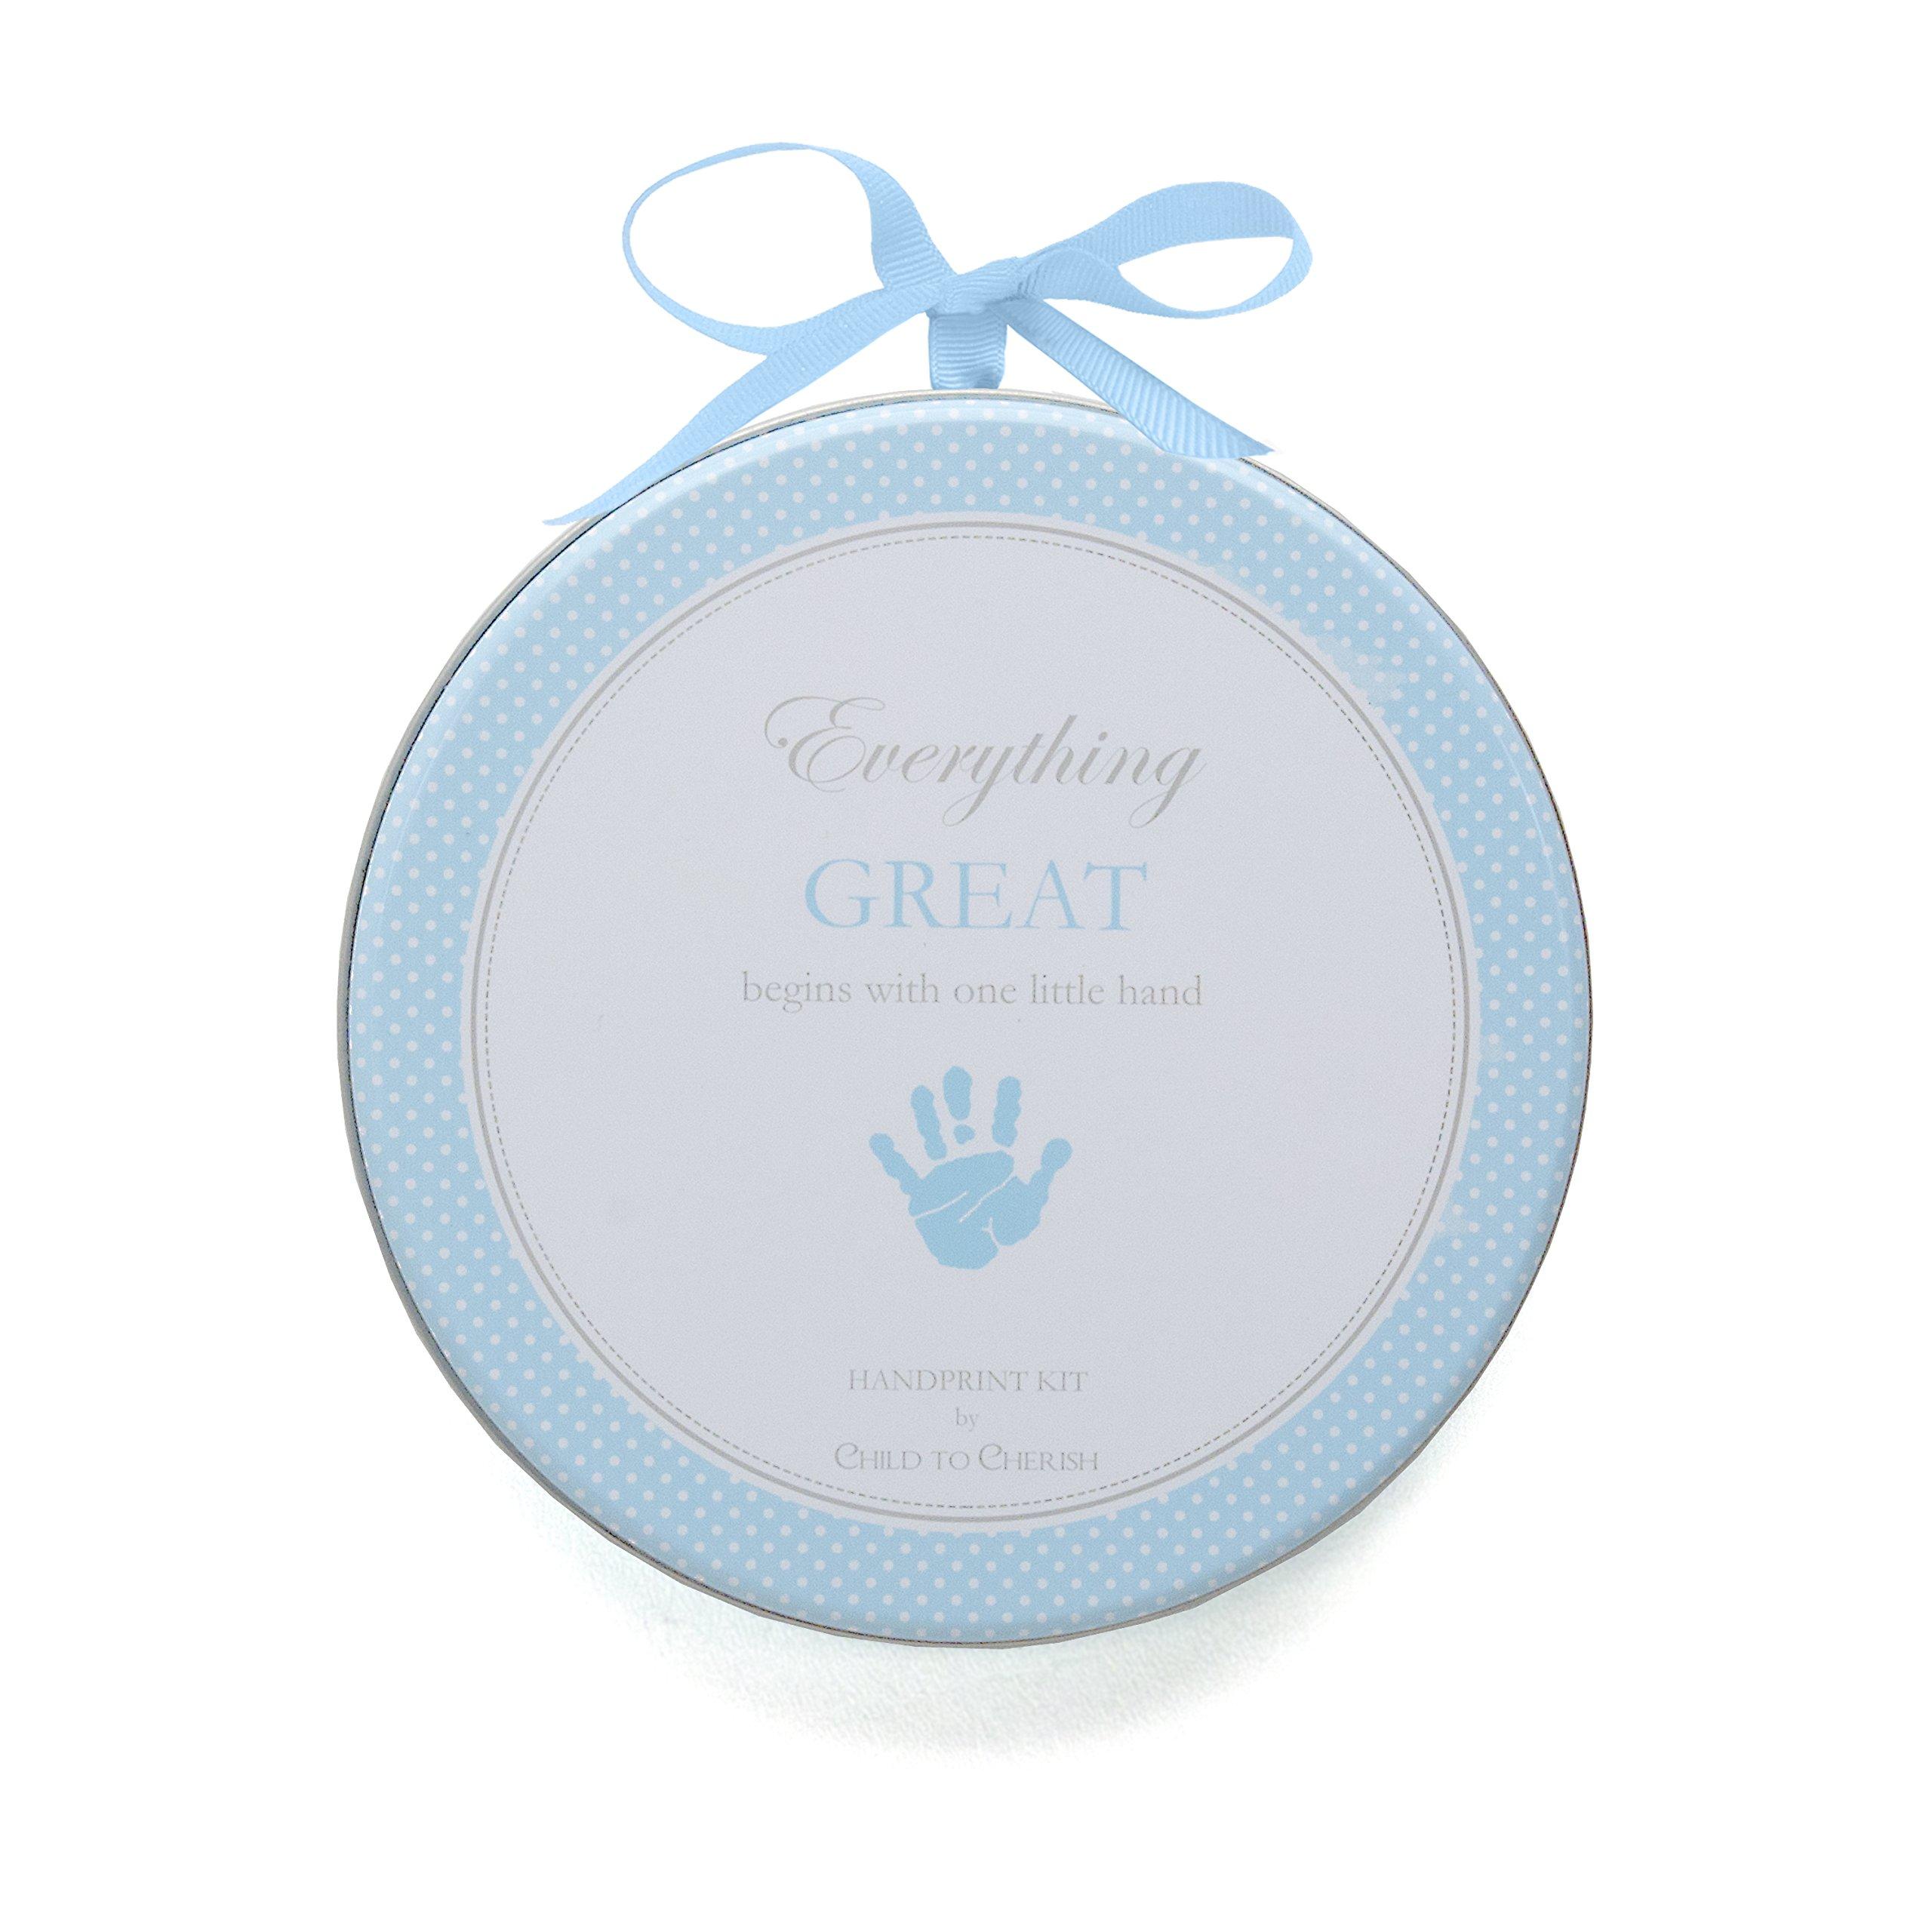 Child to Cherish My Child's Handprint with Hanger, Blue